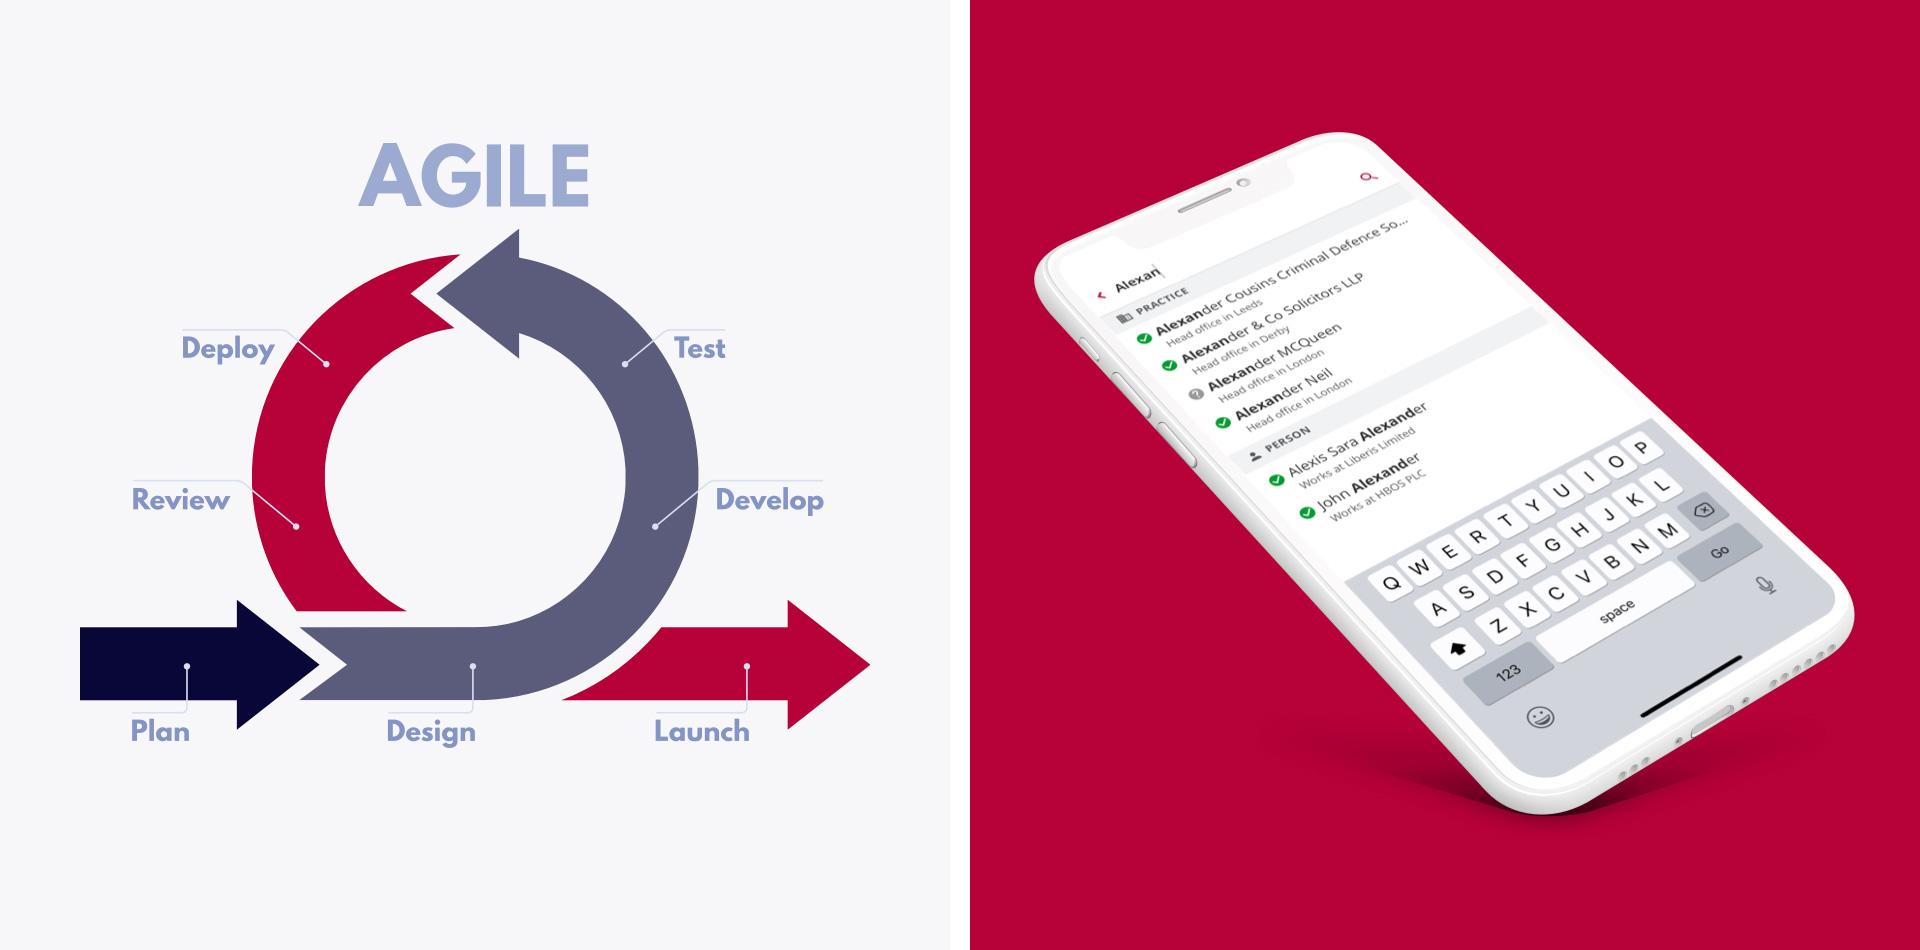 Example Agile process diagram